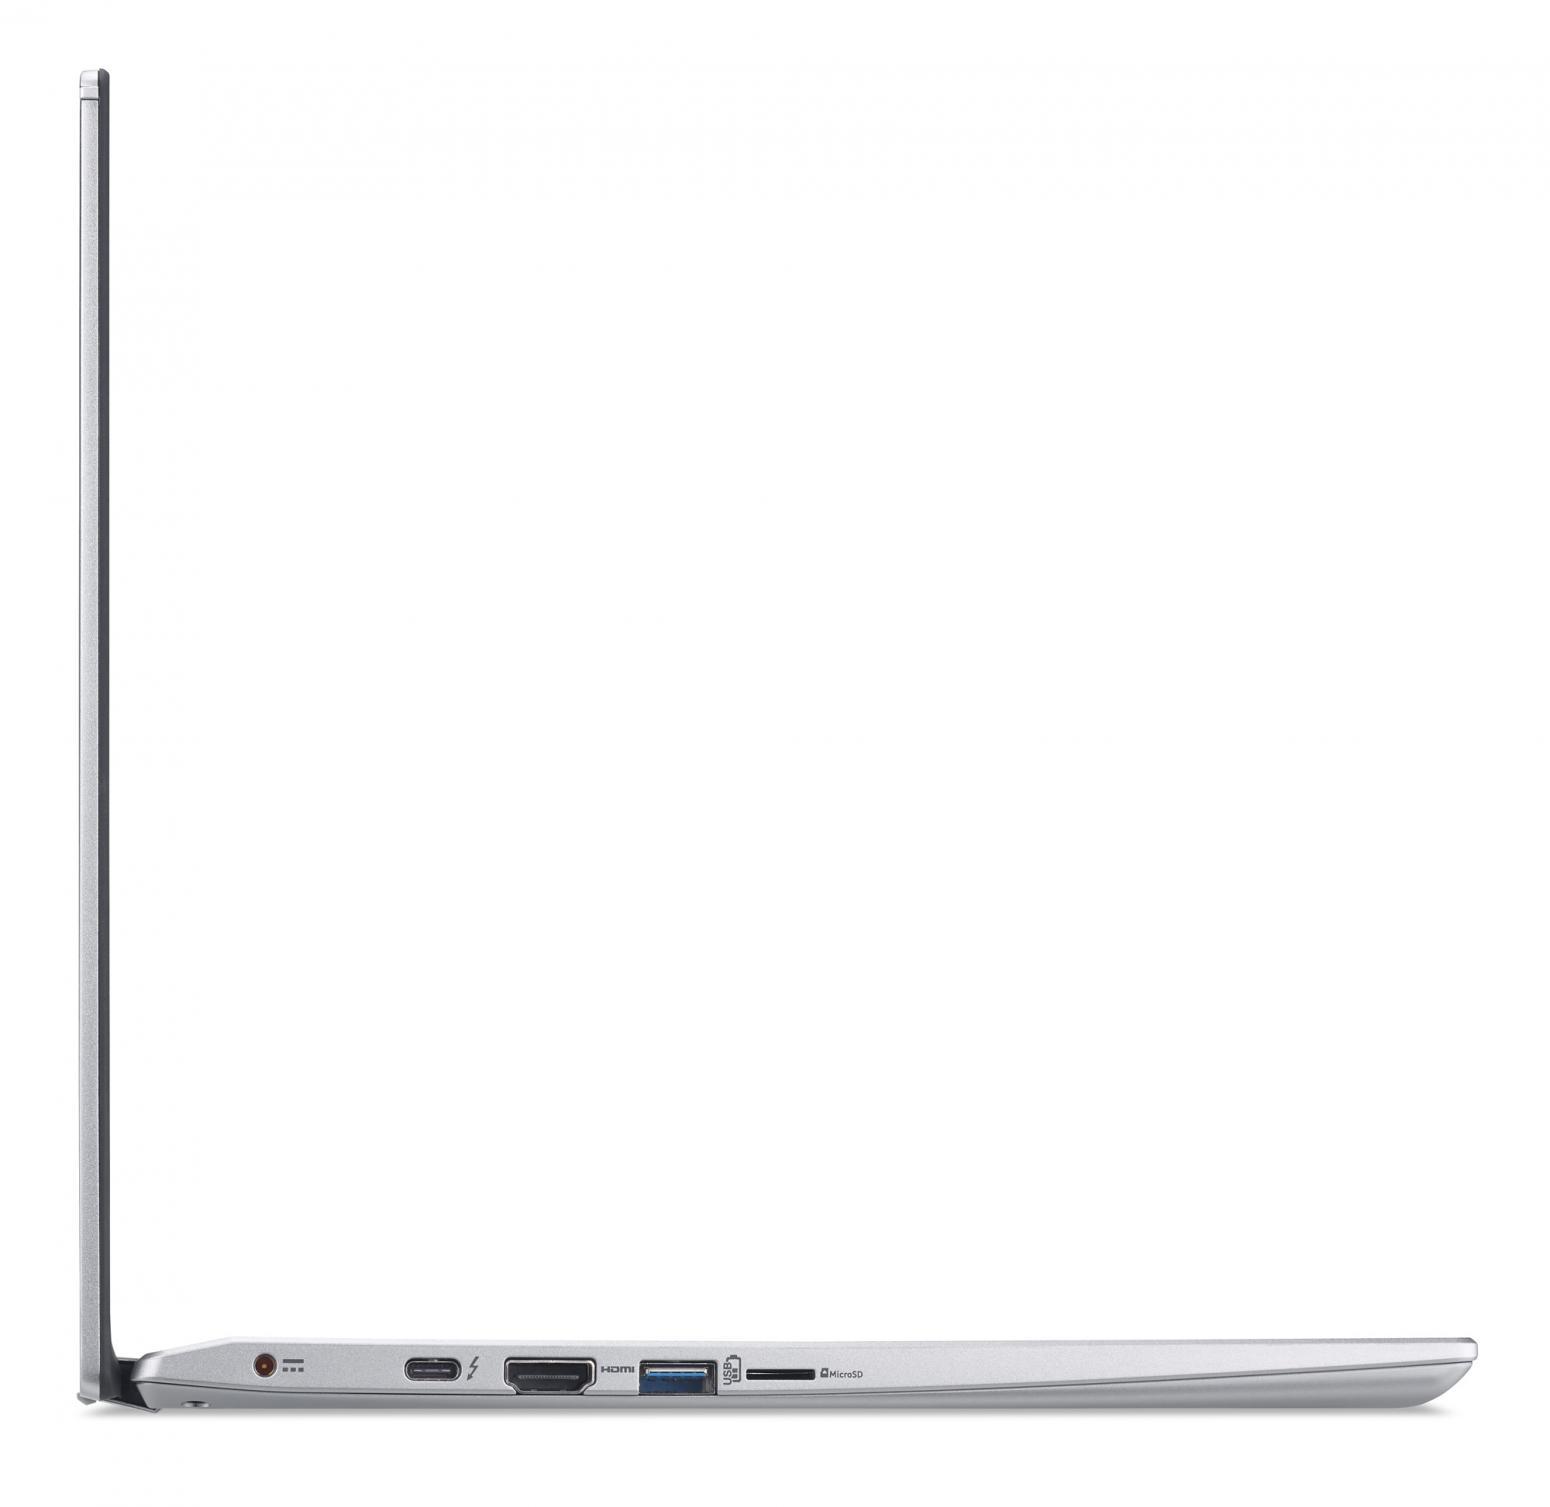 Ordinateur portable Acer Spin 3 SP314-54N-52H9 Argent - Tactile, Stylet - photo 9